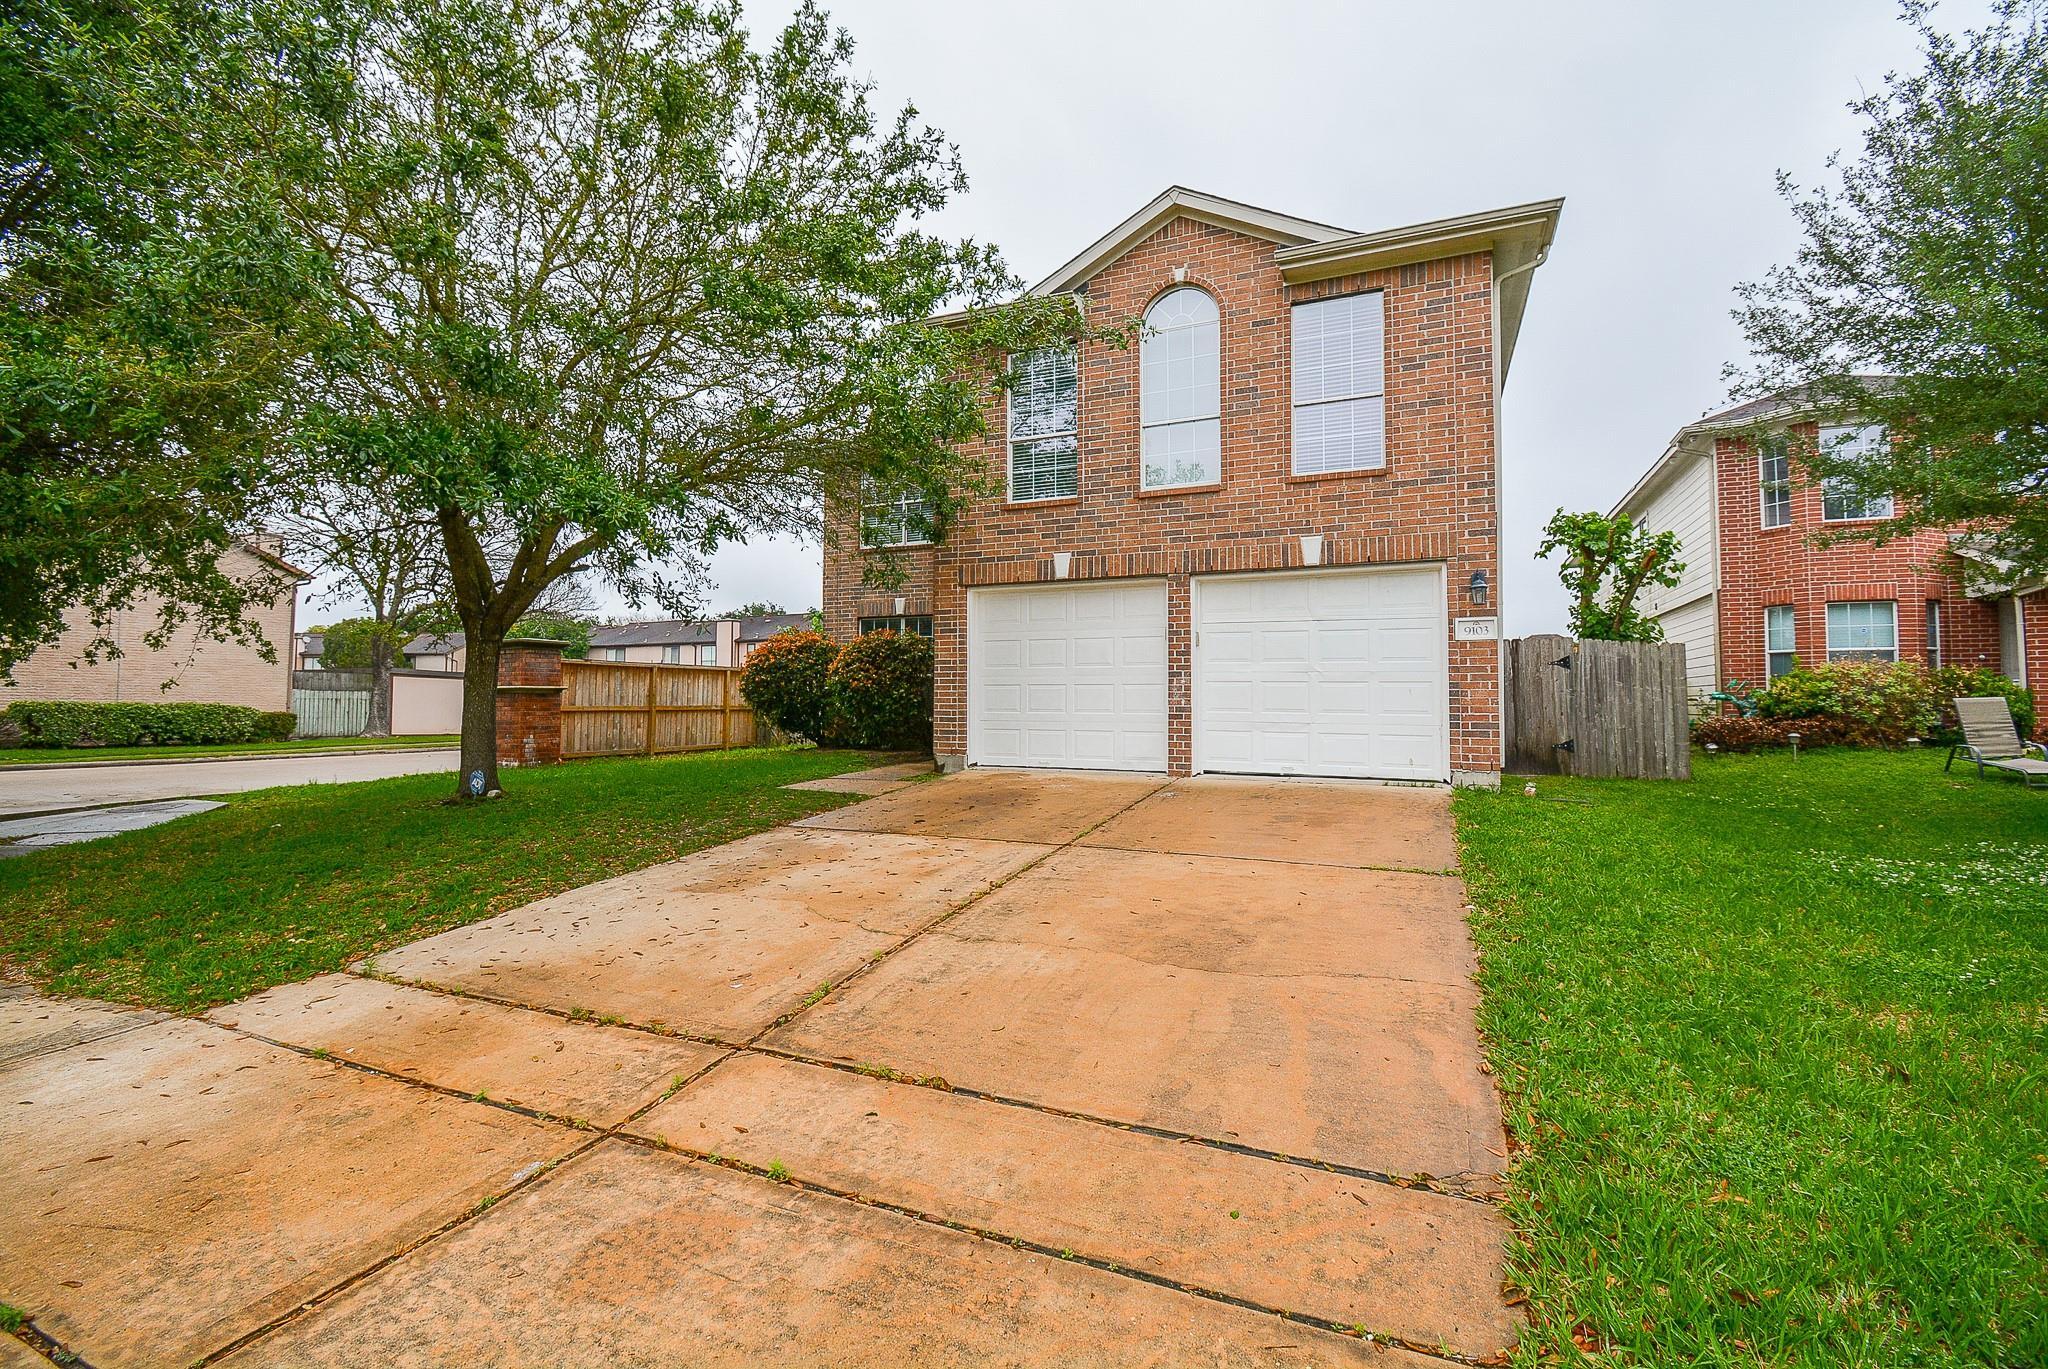 9103 Magnolia View Property Photo